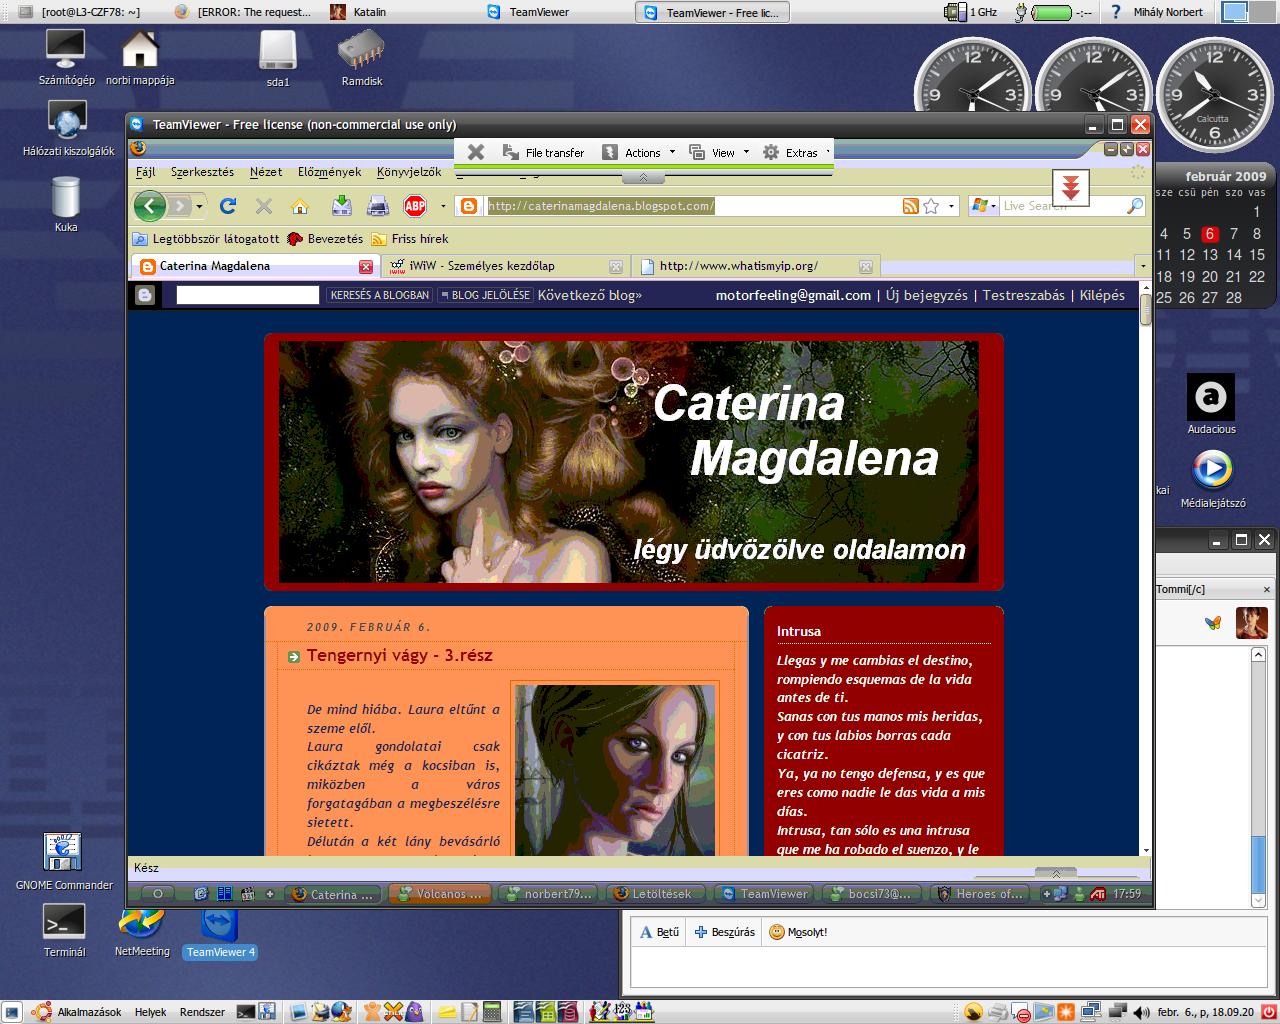 Ubuntu Desktop - 6th of February, 2009 by norbert79